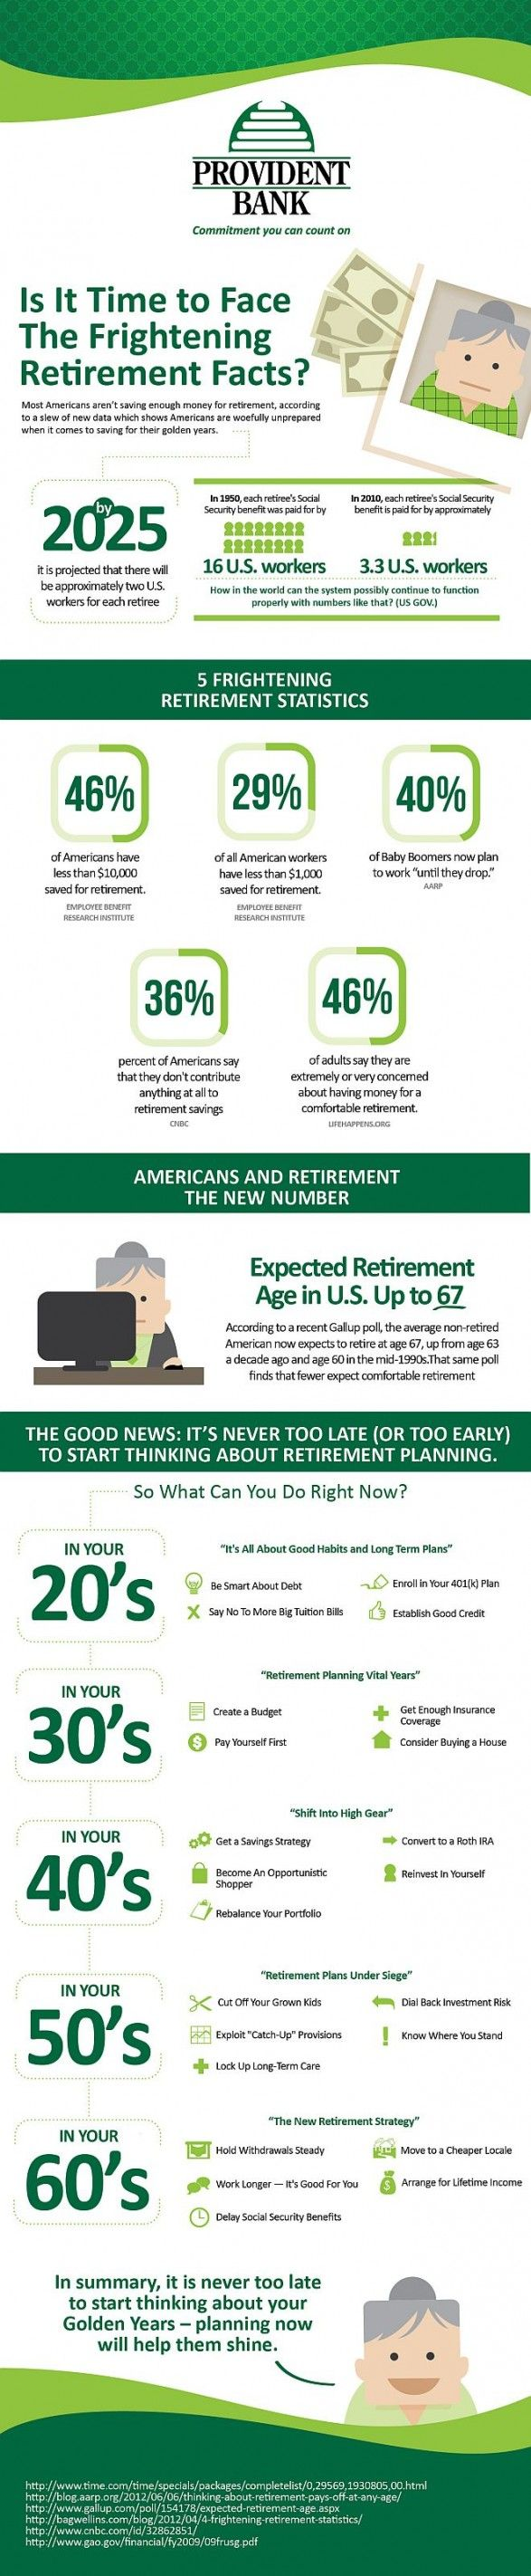 America's Frightening Retirement Facts